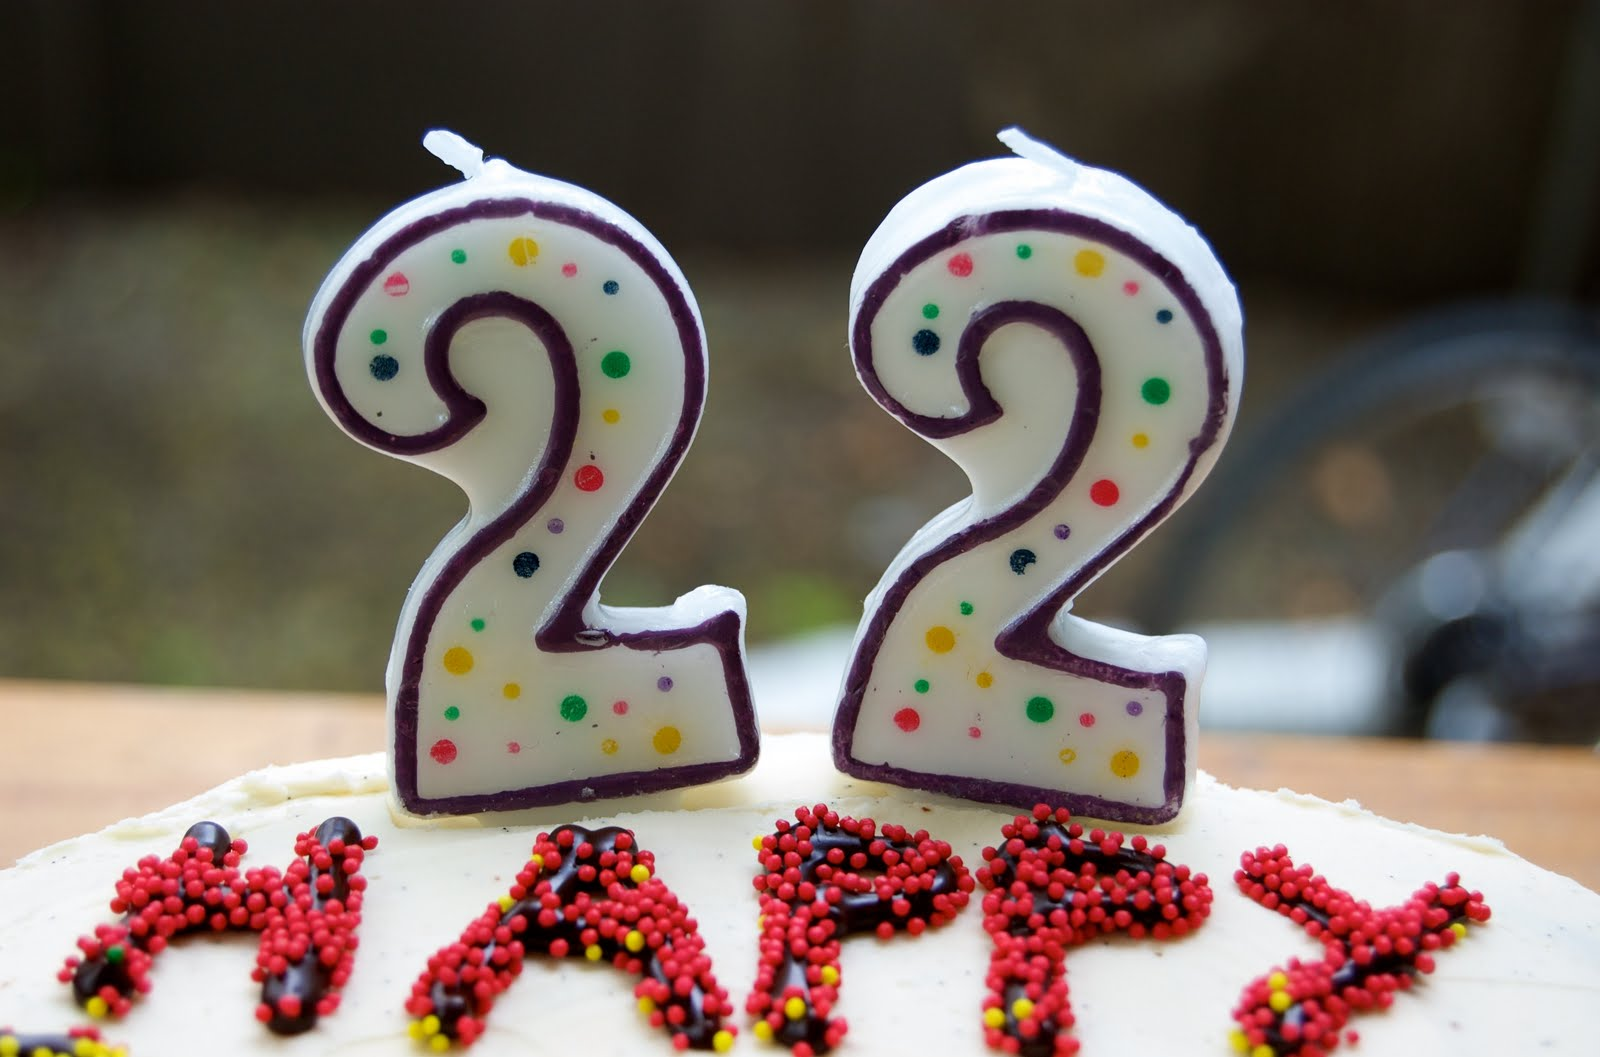 Chocolate Cake For Nd Birthday